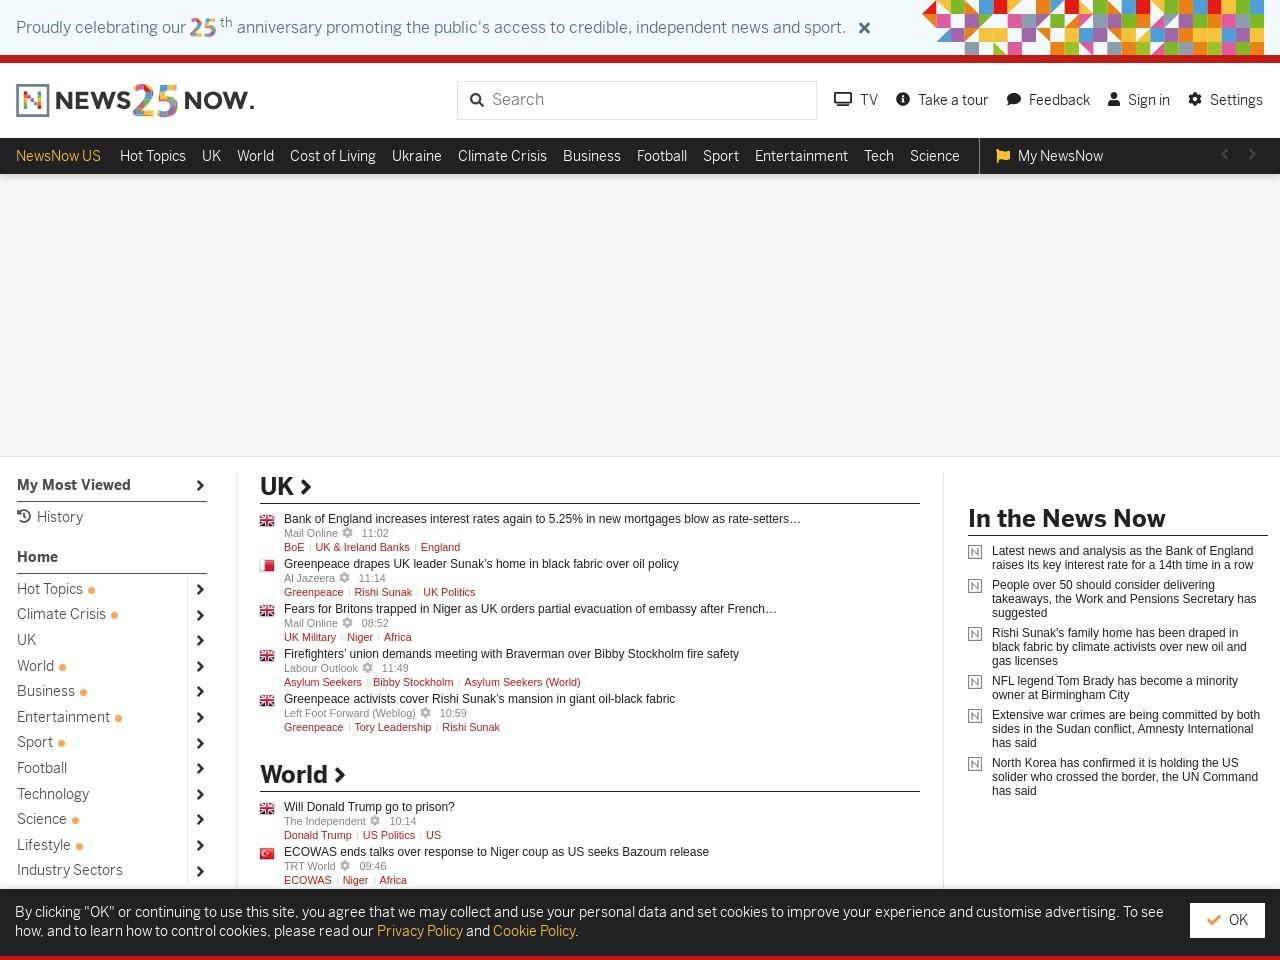 newsnow.co.uk